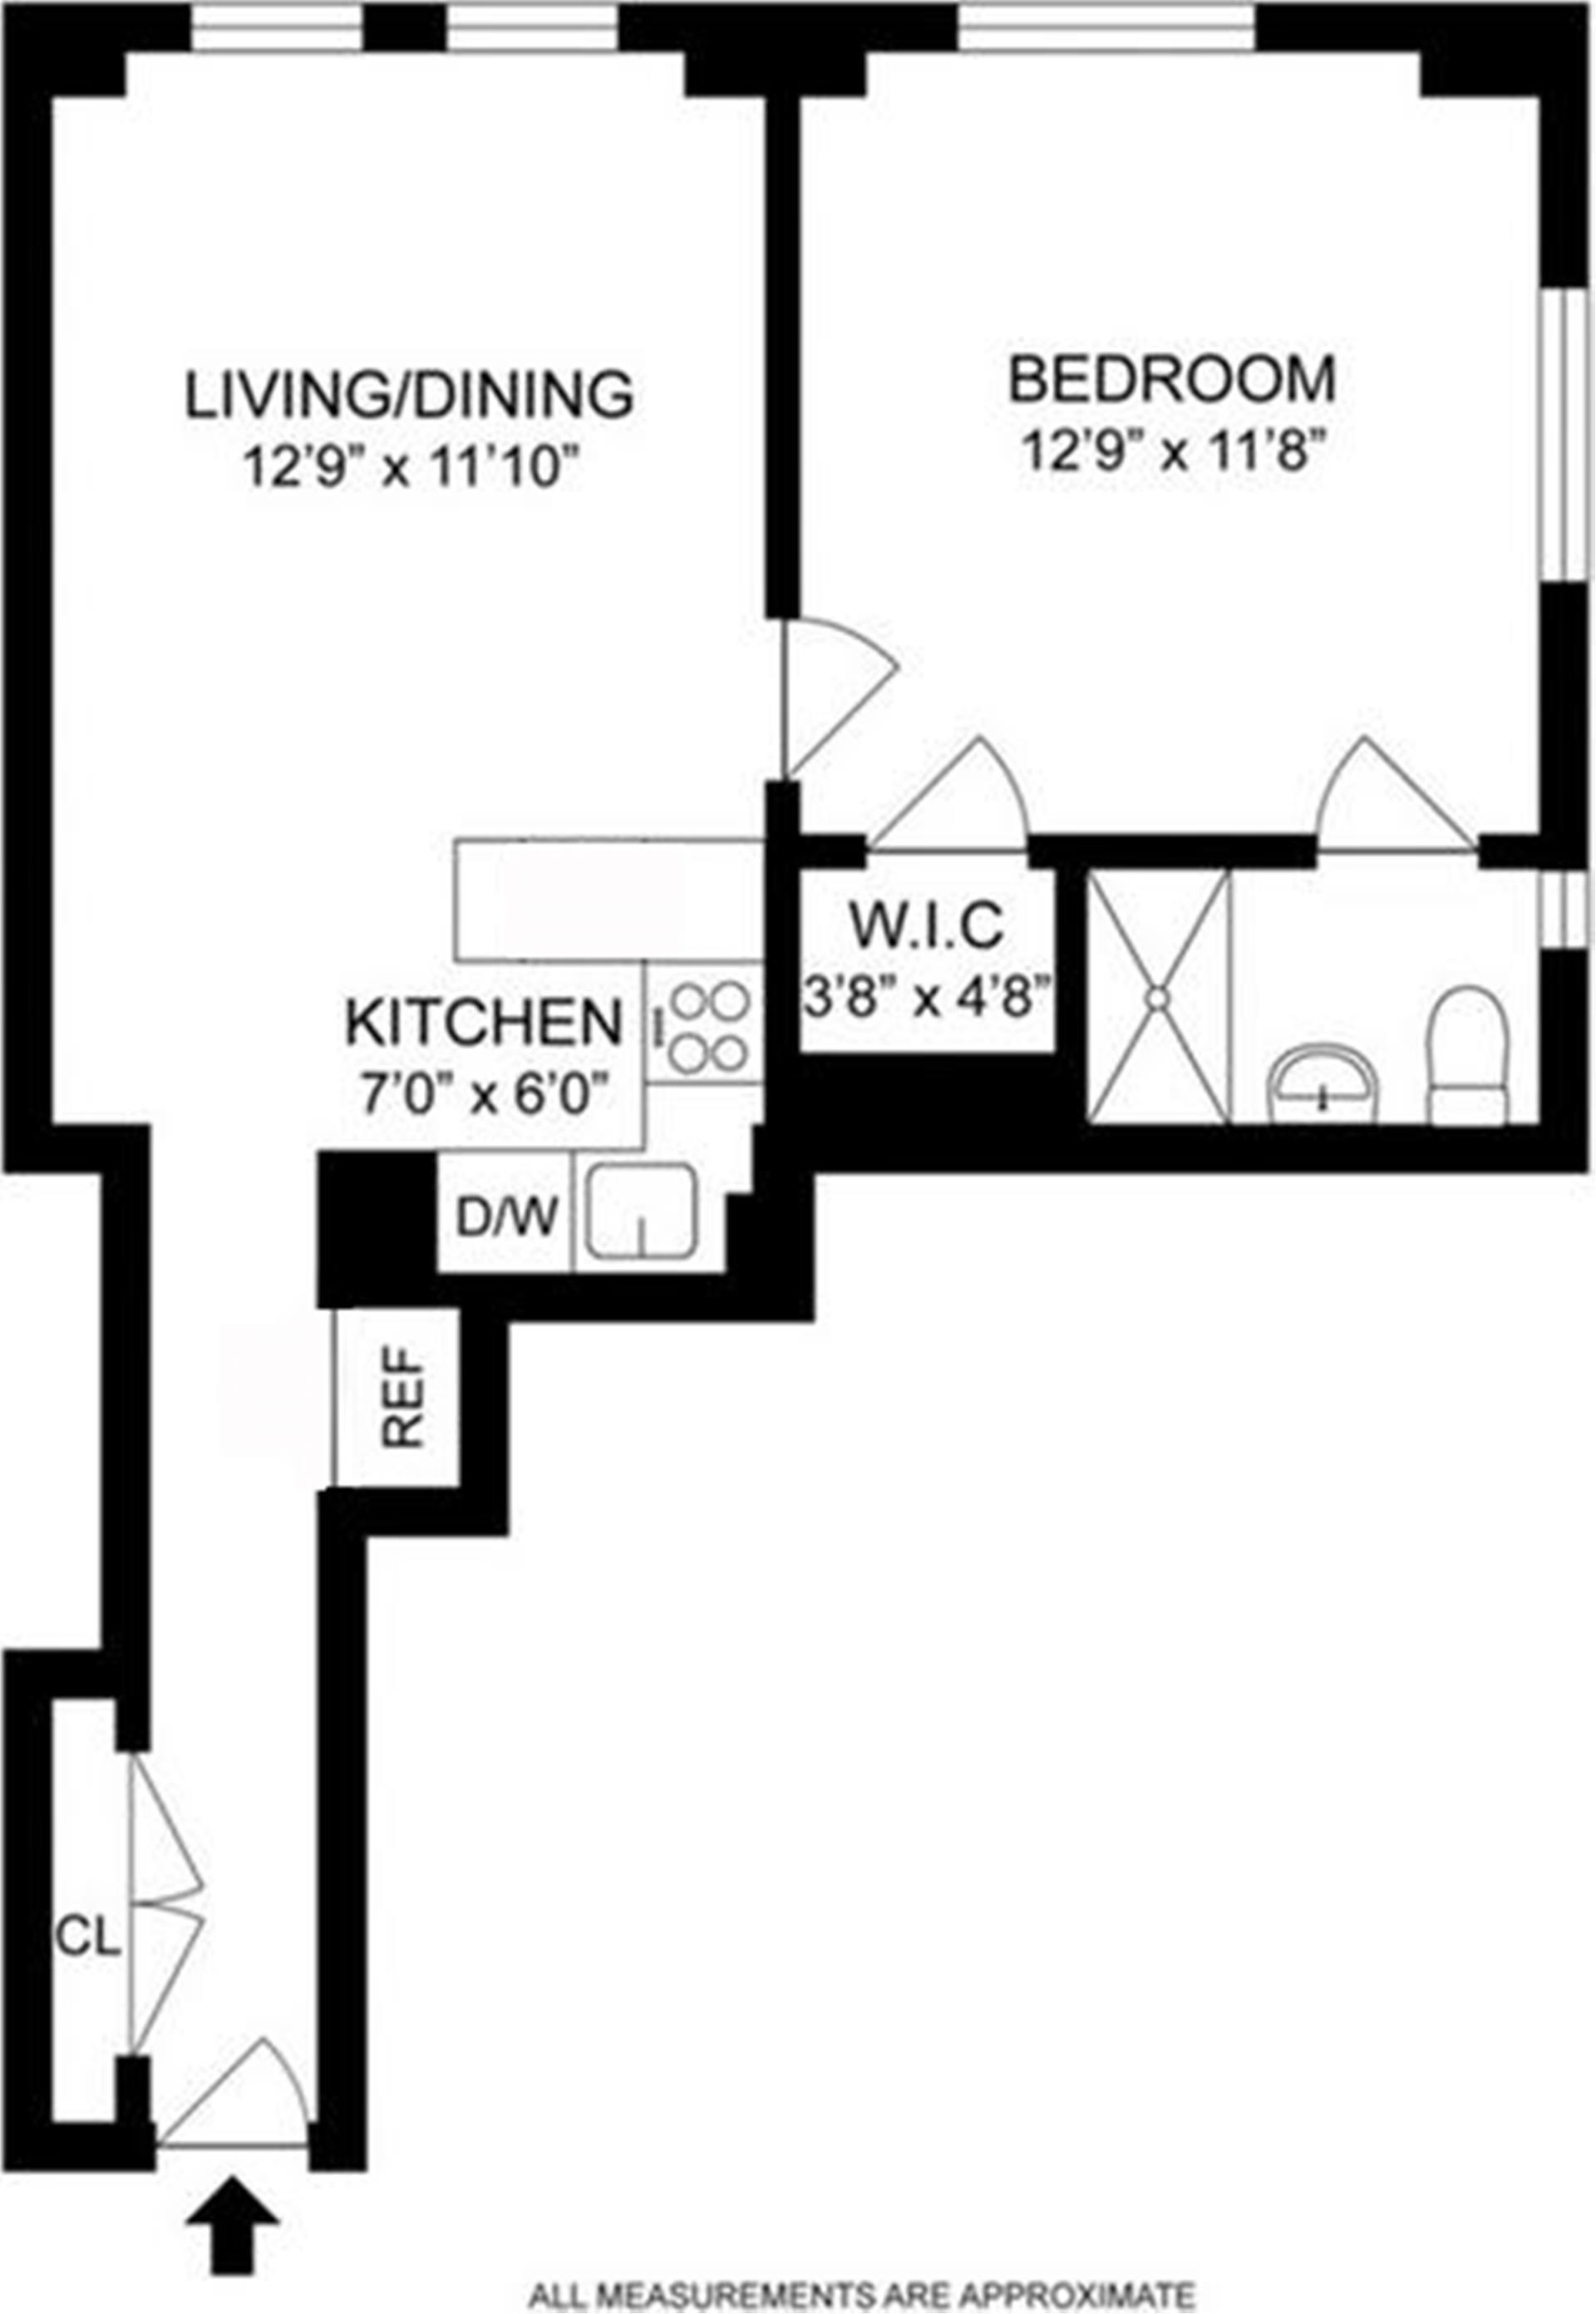 Floor plan of WINDSOR TOWER, 5 Tudor City Pl, 711 - Murray Hill, New York